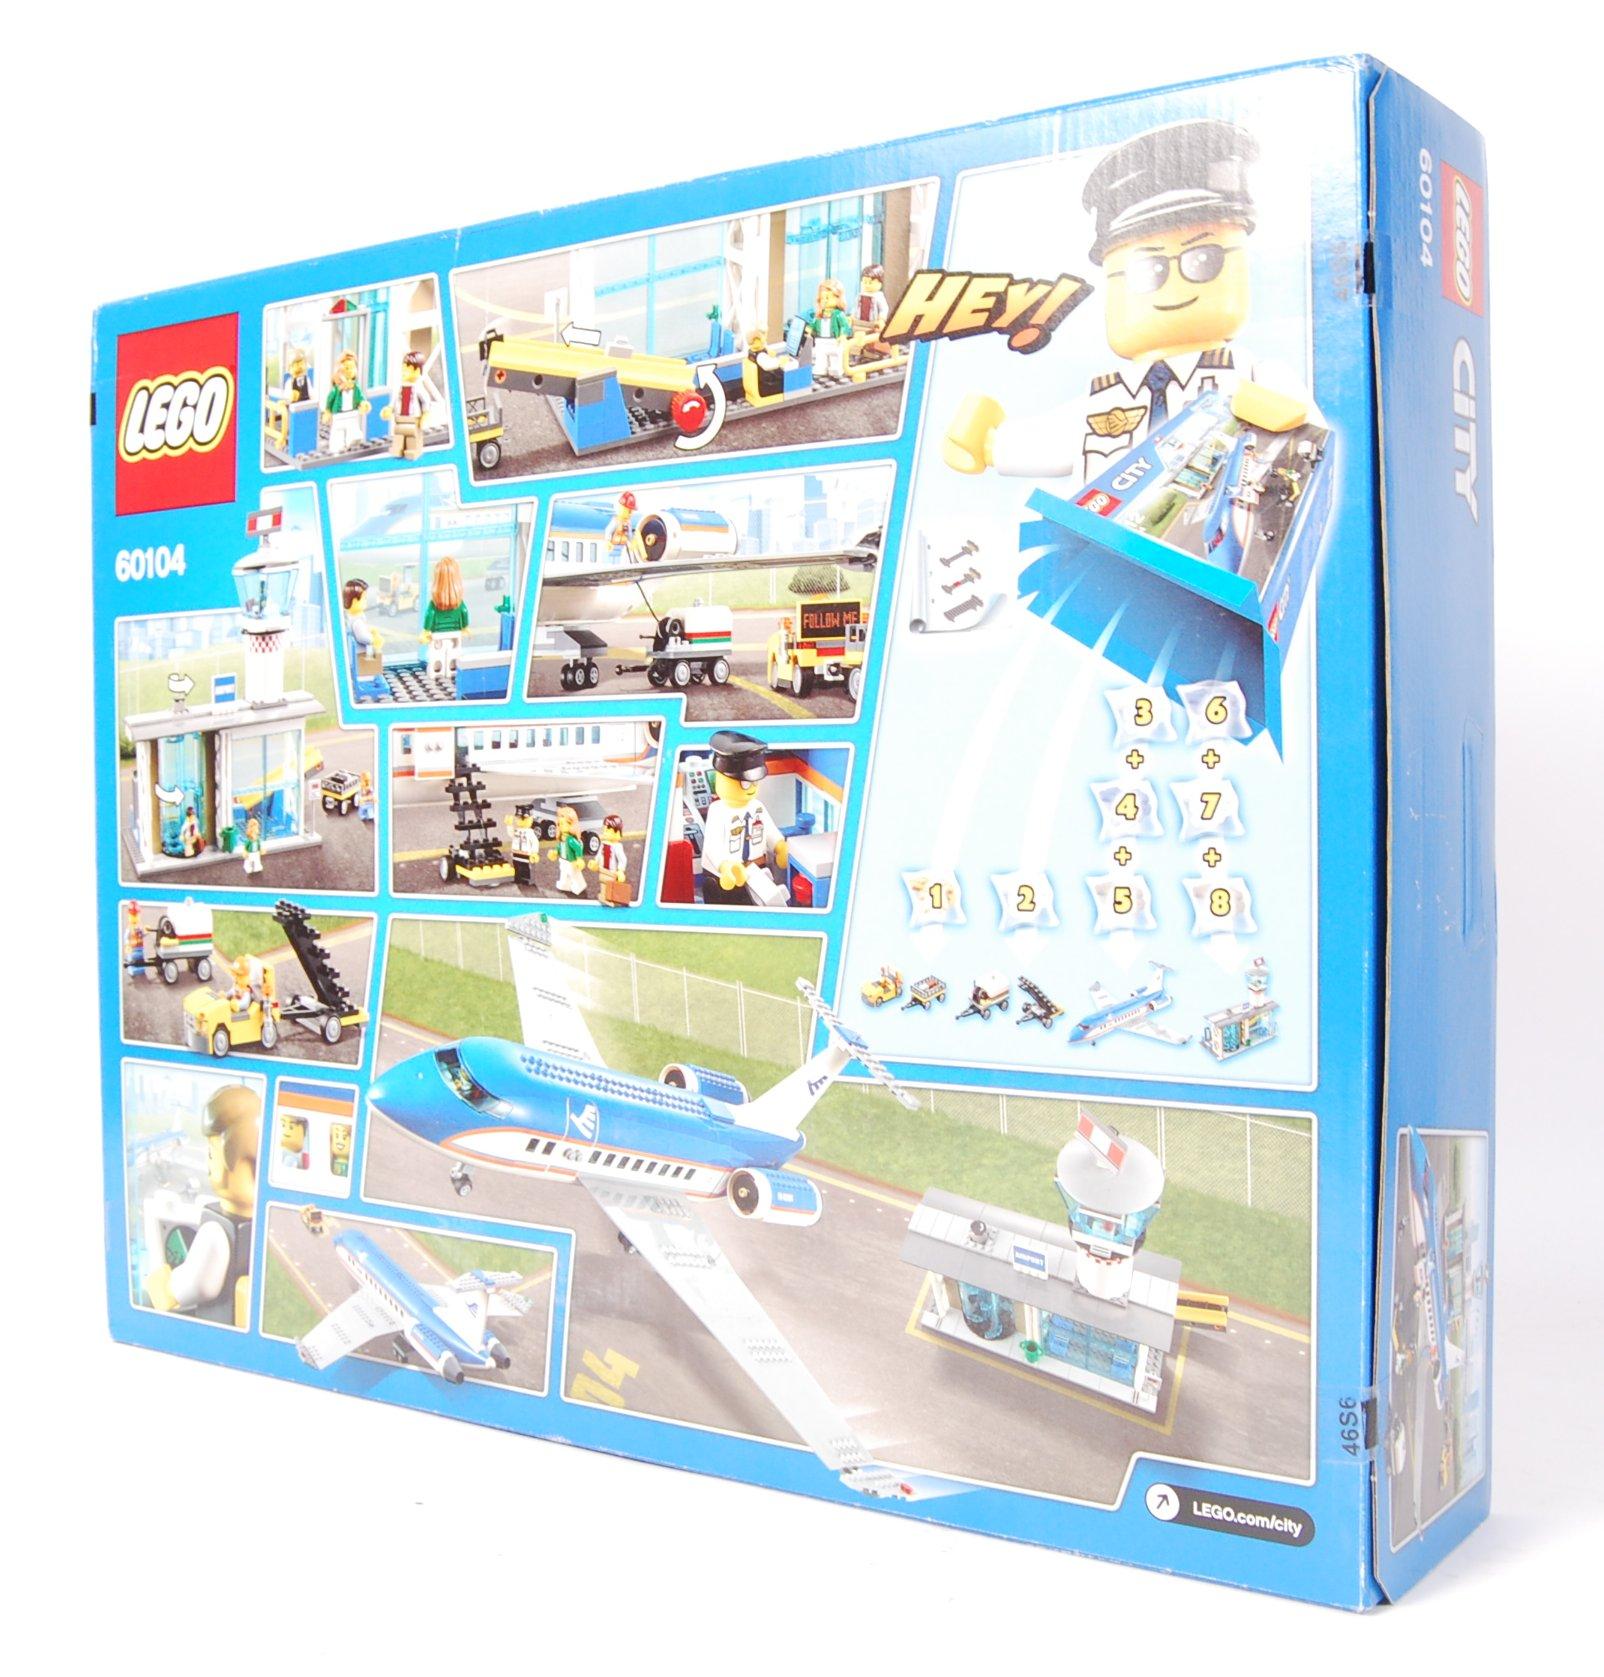 Lot 2 - LEGO CITY 60104 ' CITY AIRPORT PASSENGER TERMINAL